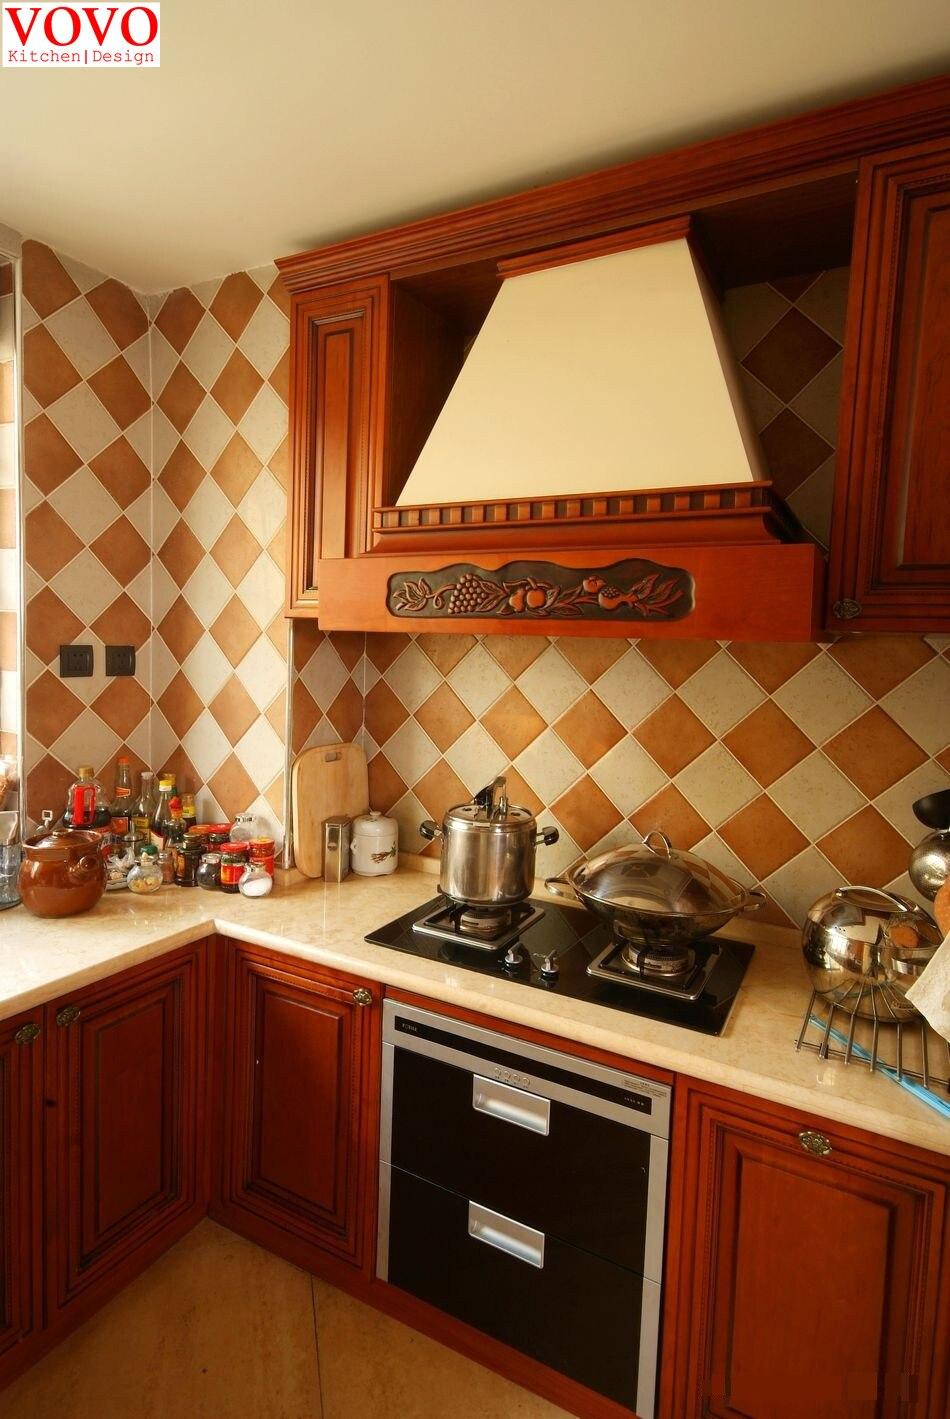 Online kopen Wholesale keukenkasten rood uit China keukenkasten ...